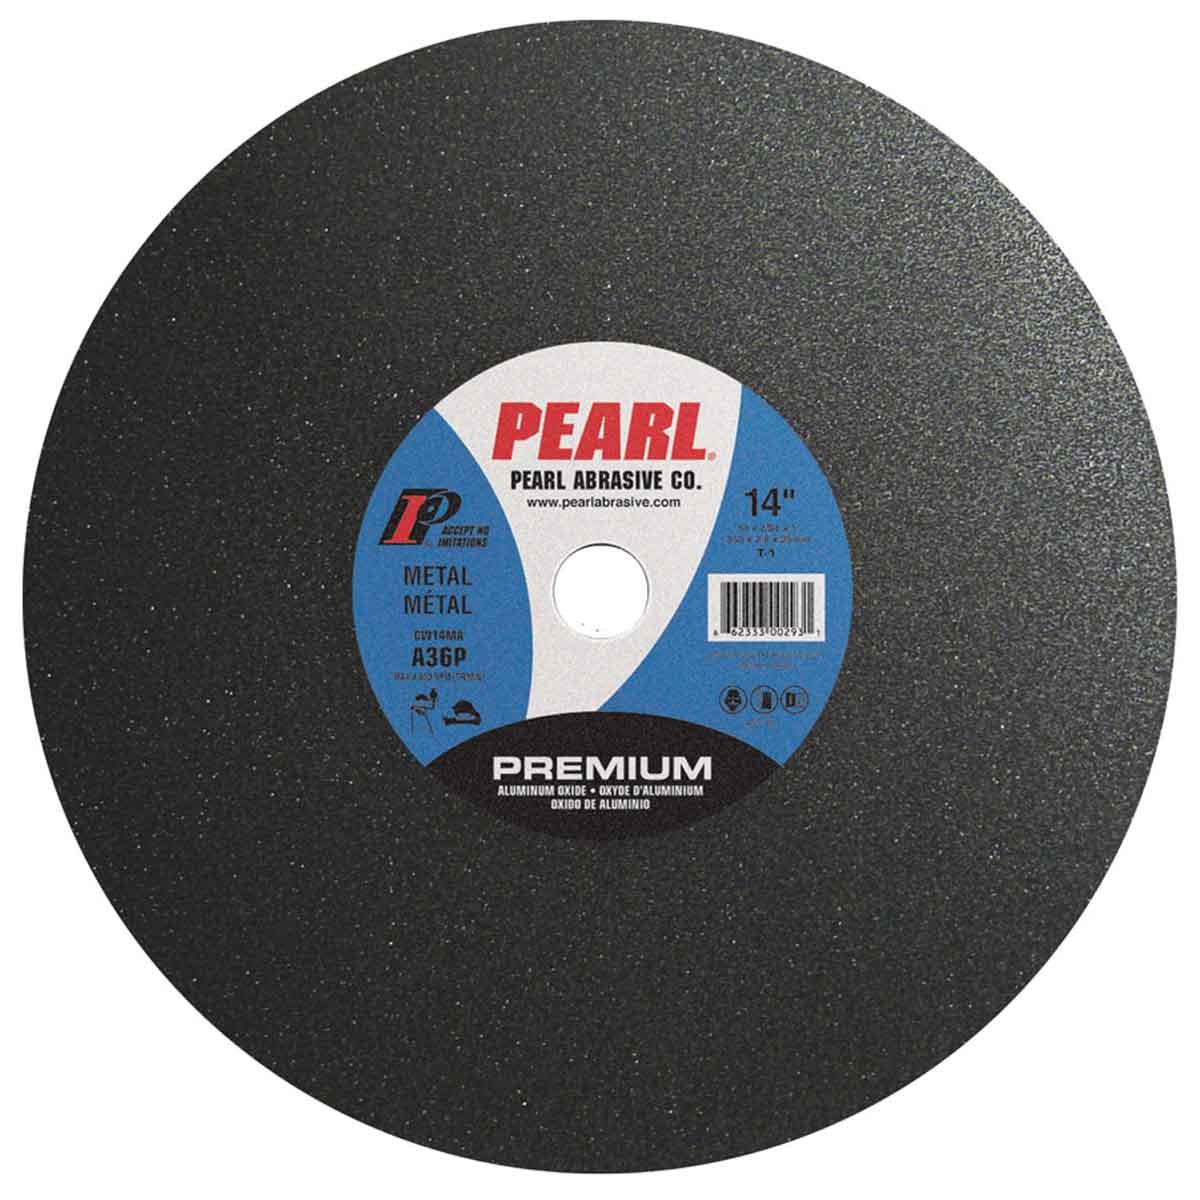 Pearl Abrasive cut off wheels